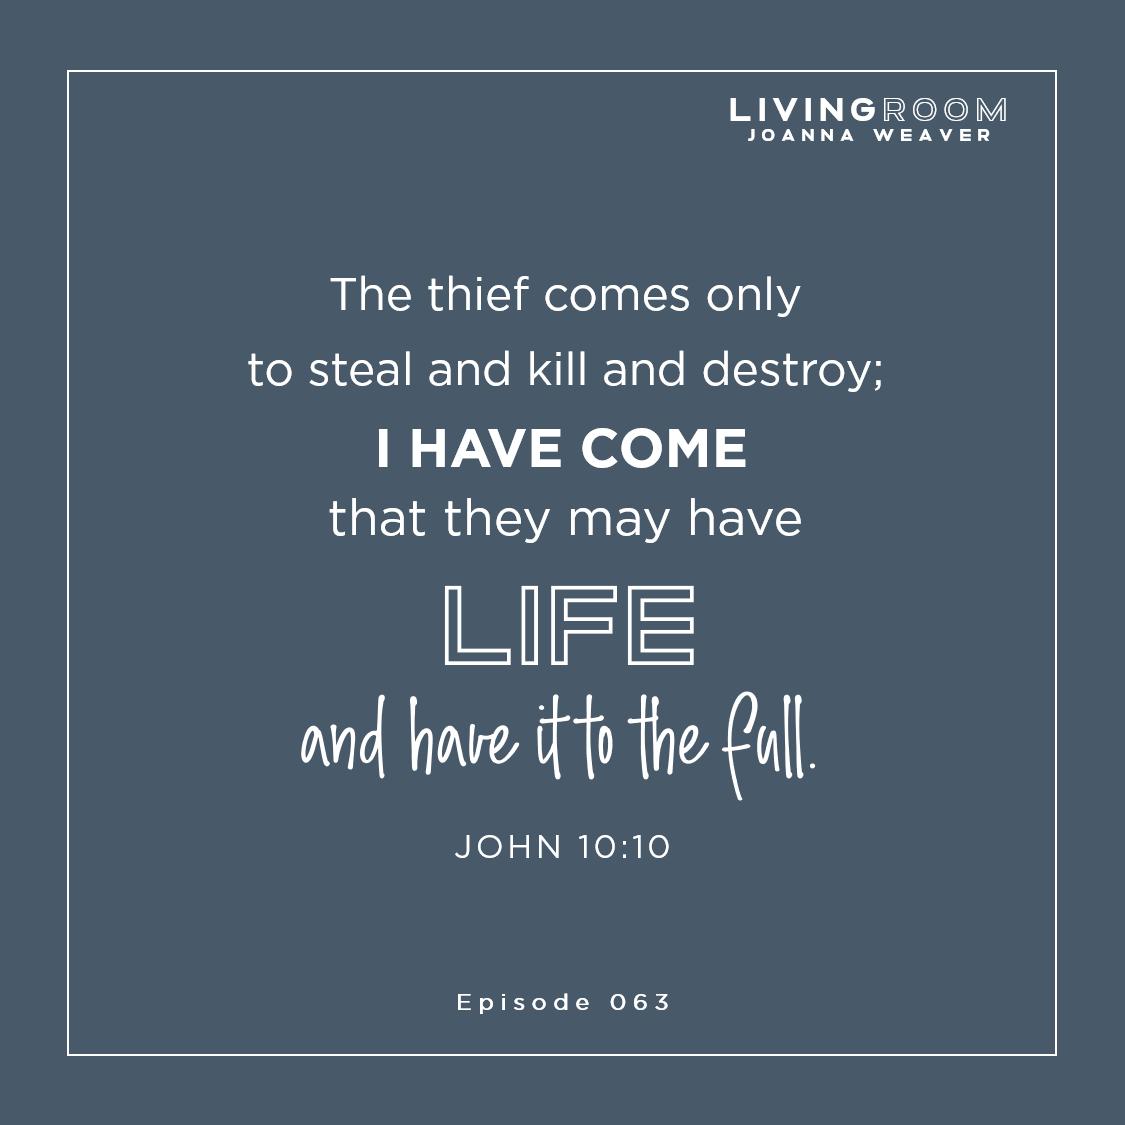 John 10:10 - The Living Room with Joanna Weaver